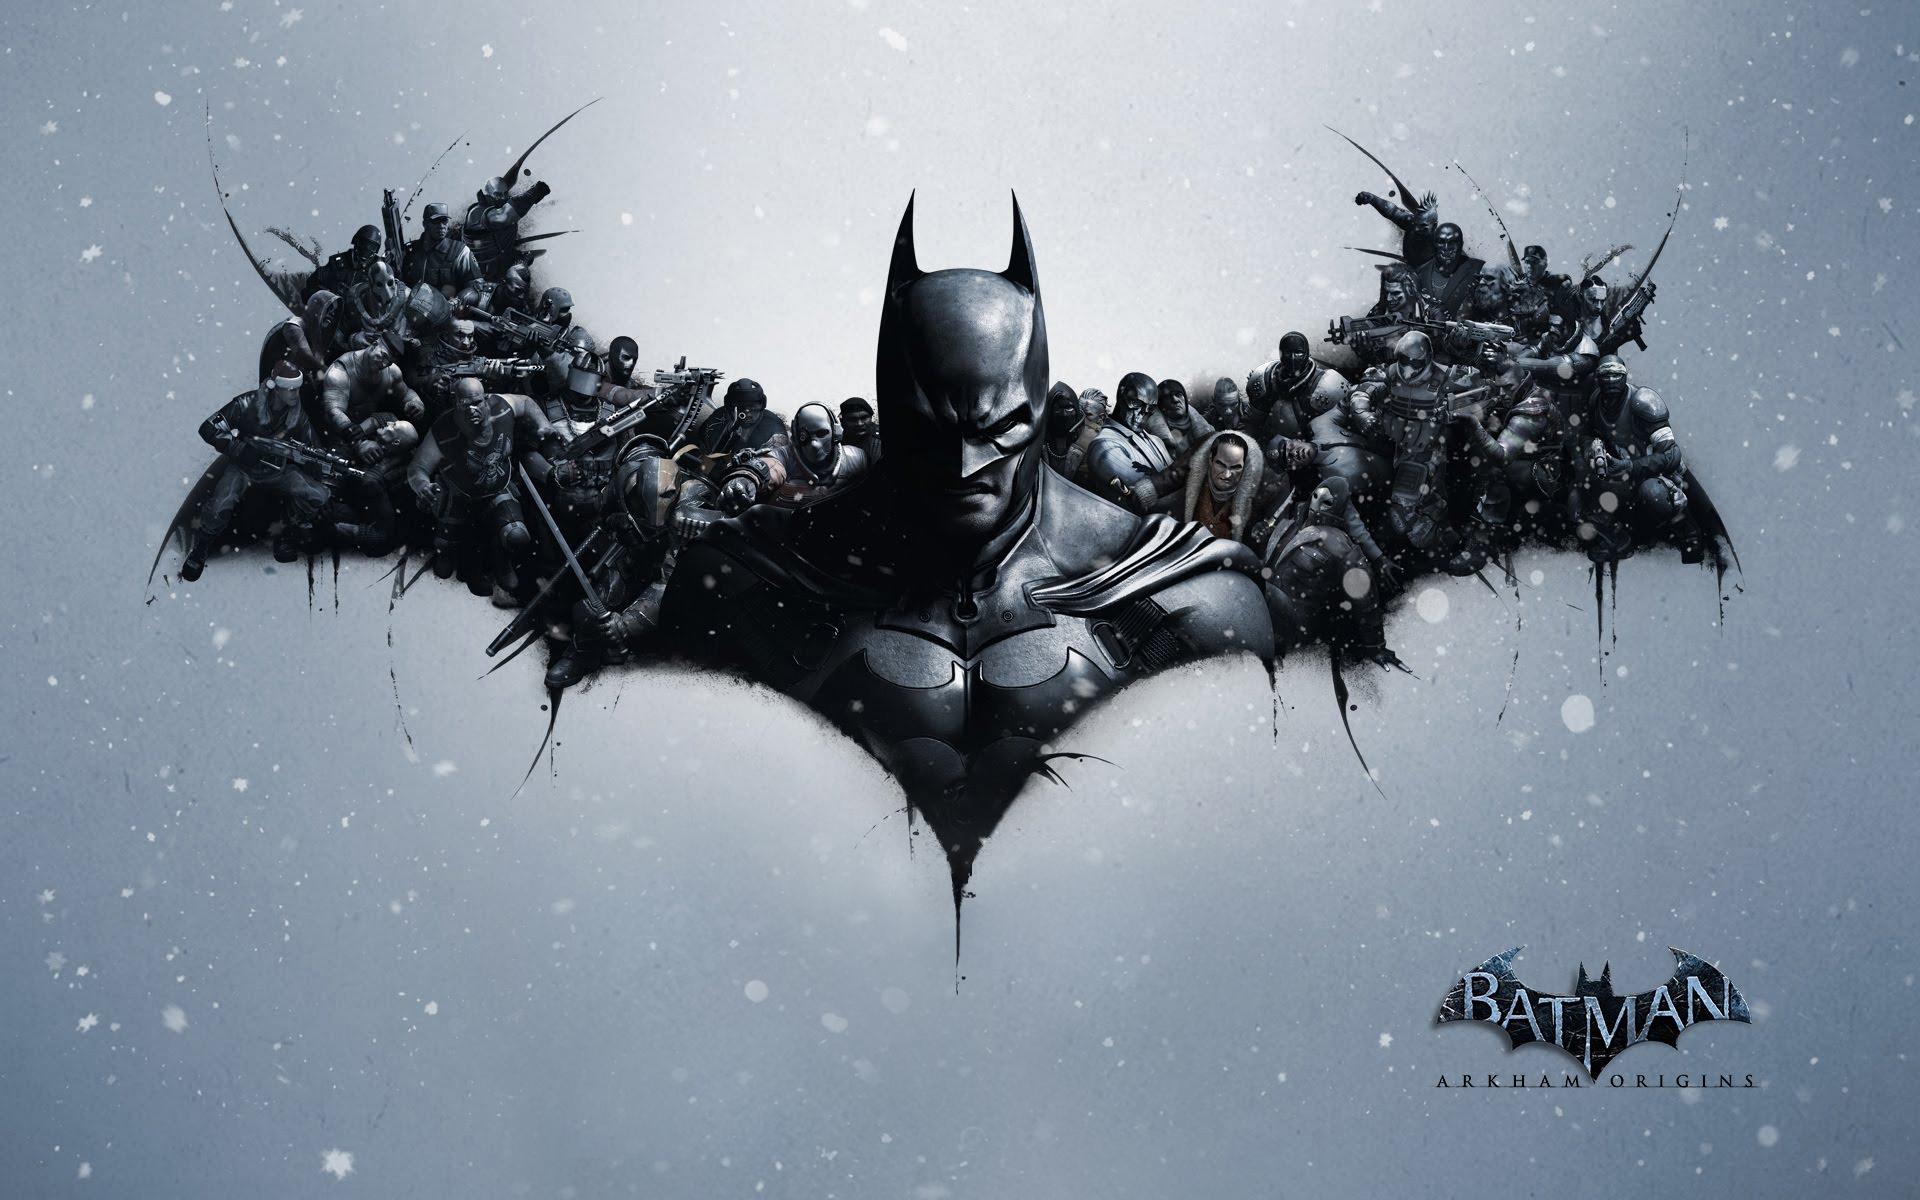 batman_arkham_origins_video_game-wide.jpg